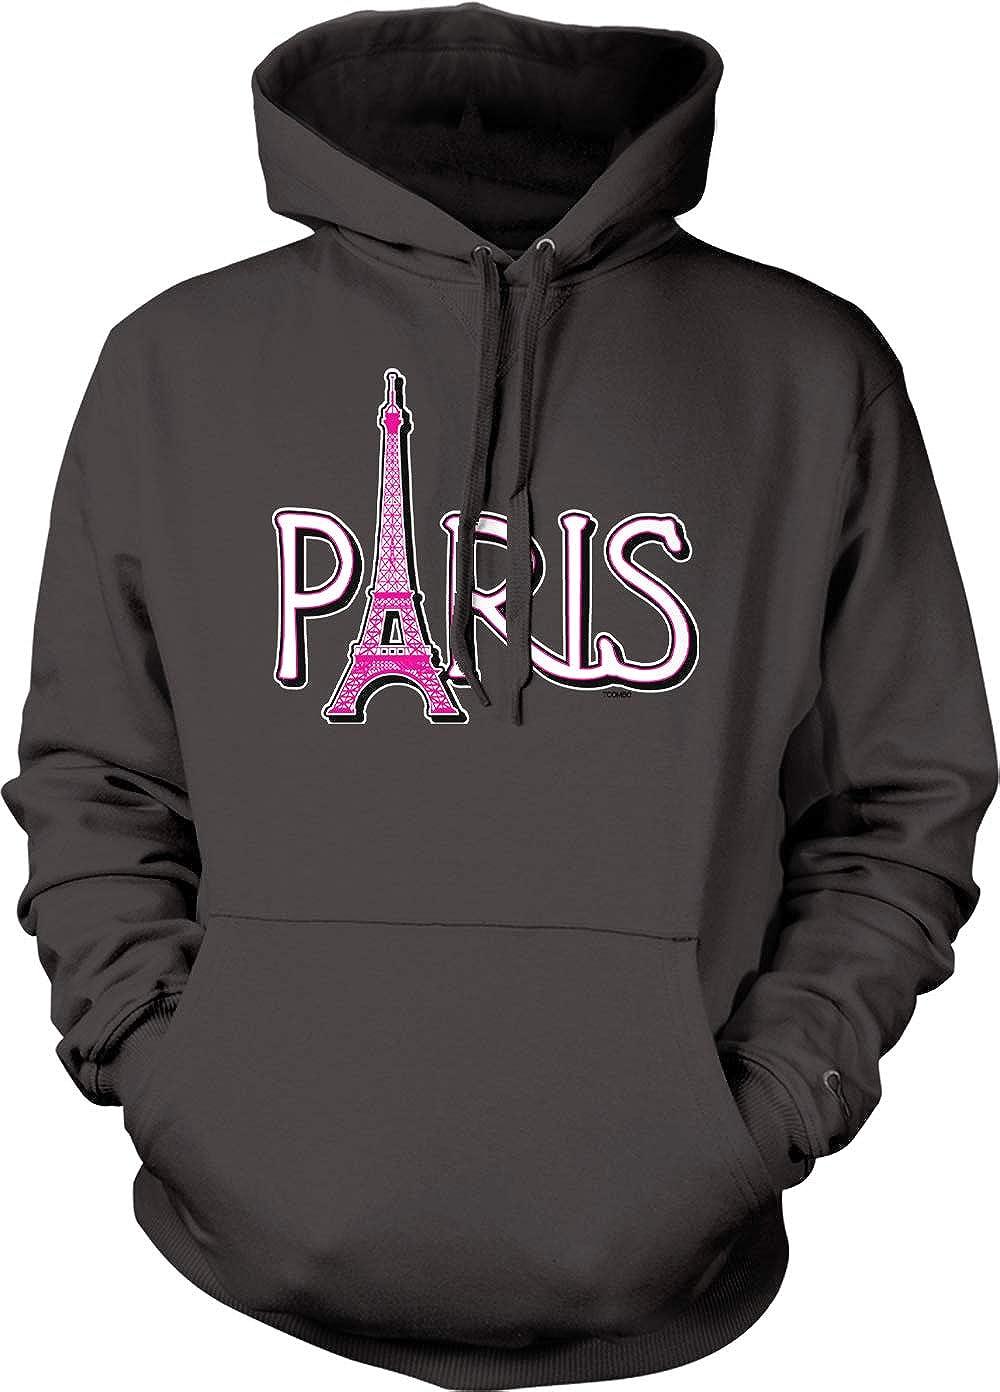 France Tourist Unisex Hoodie Sweatshirt Paris Eiffel Tower